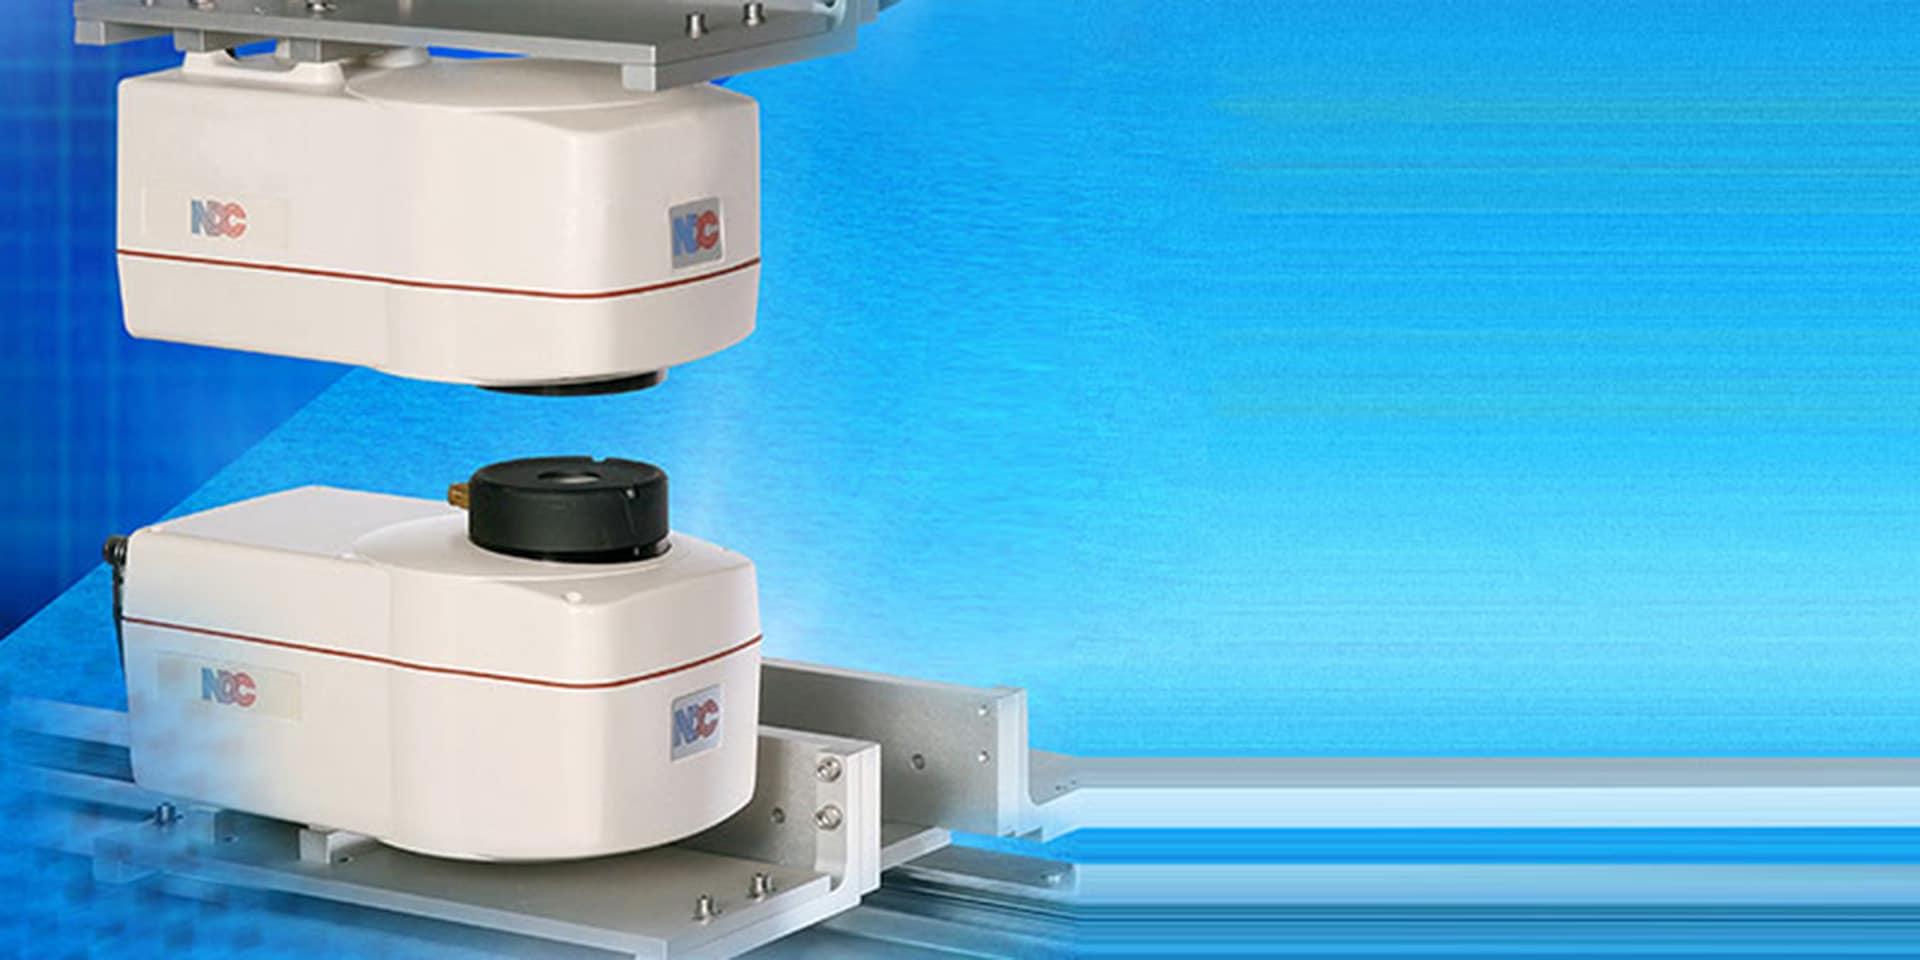 sensores ndc technologies transmision